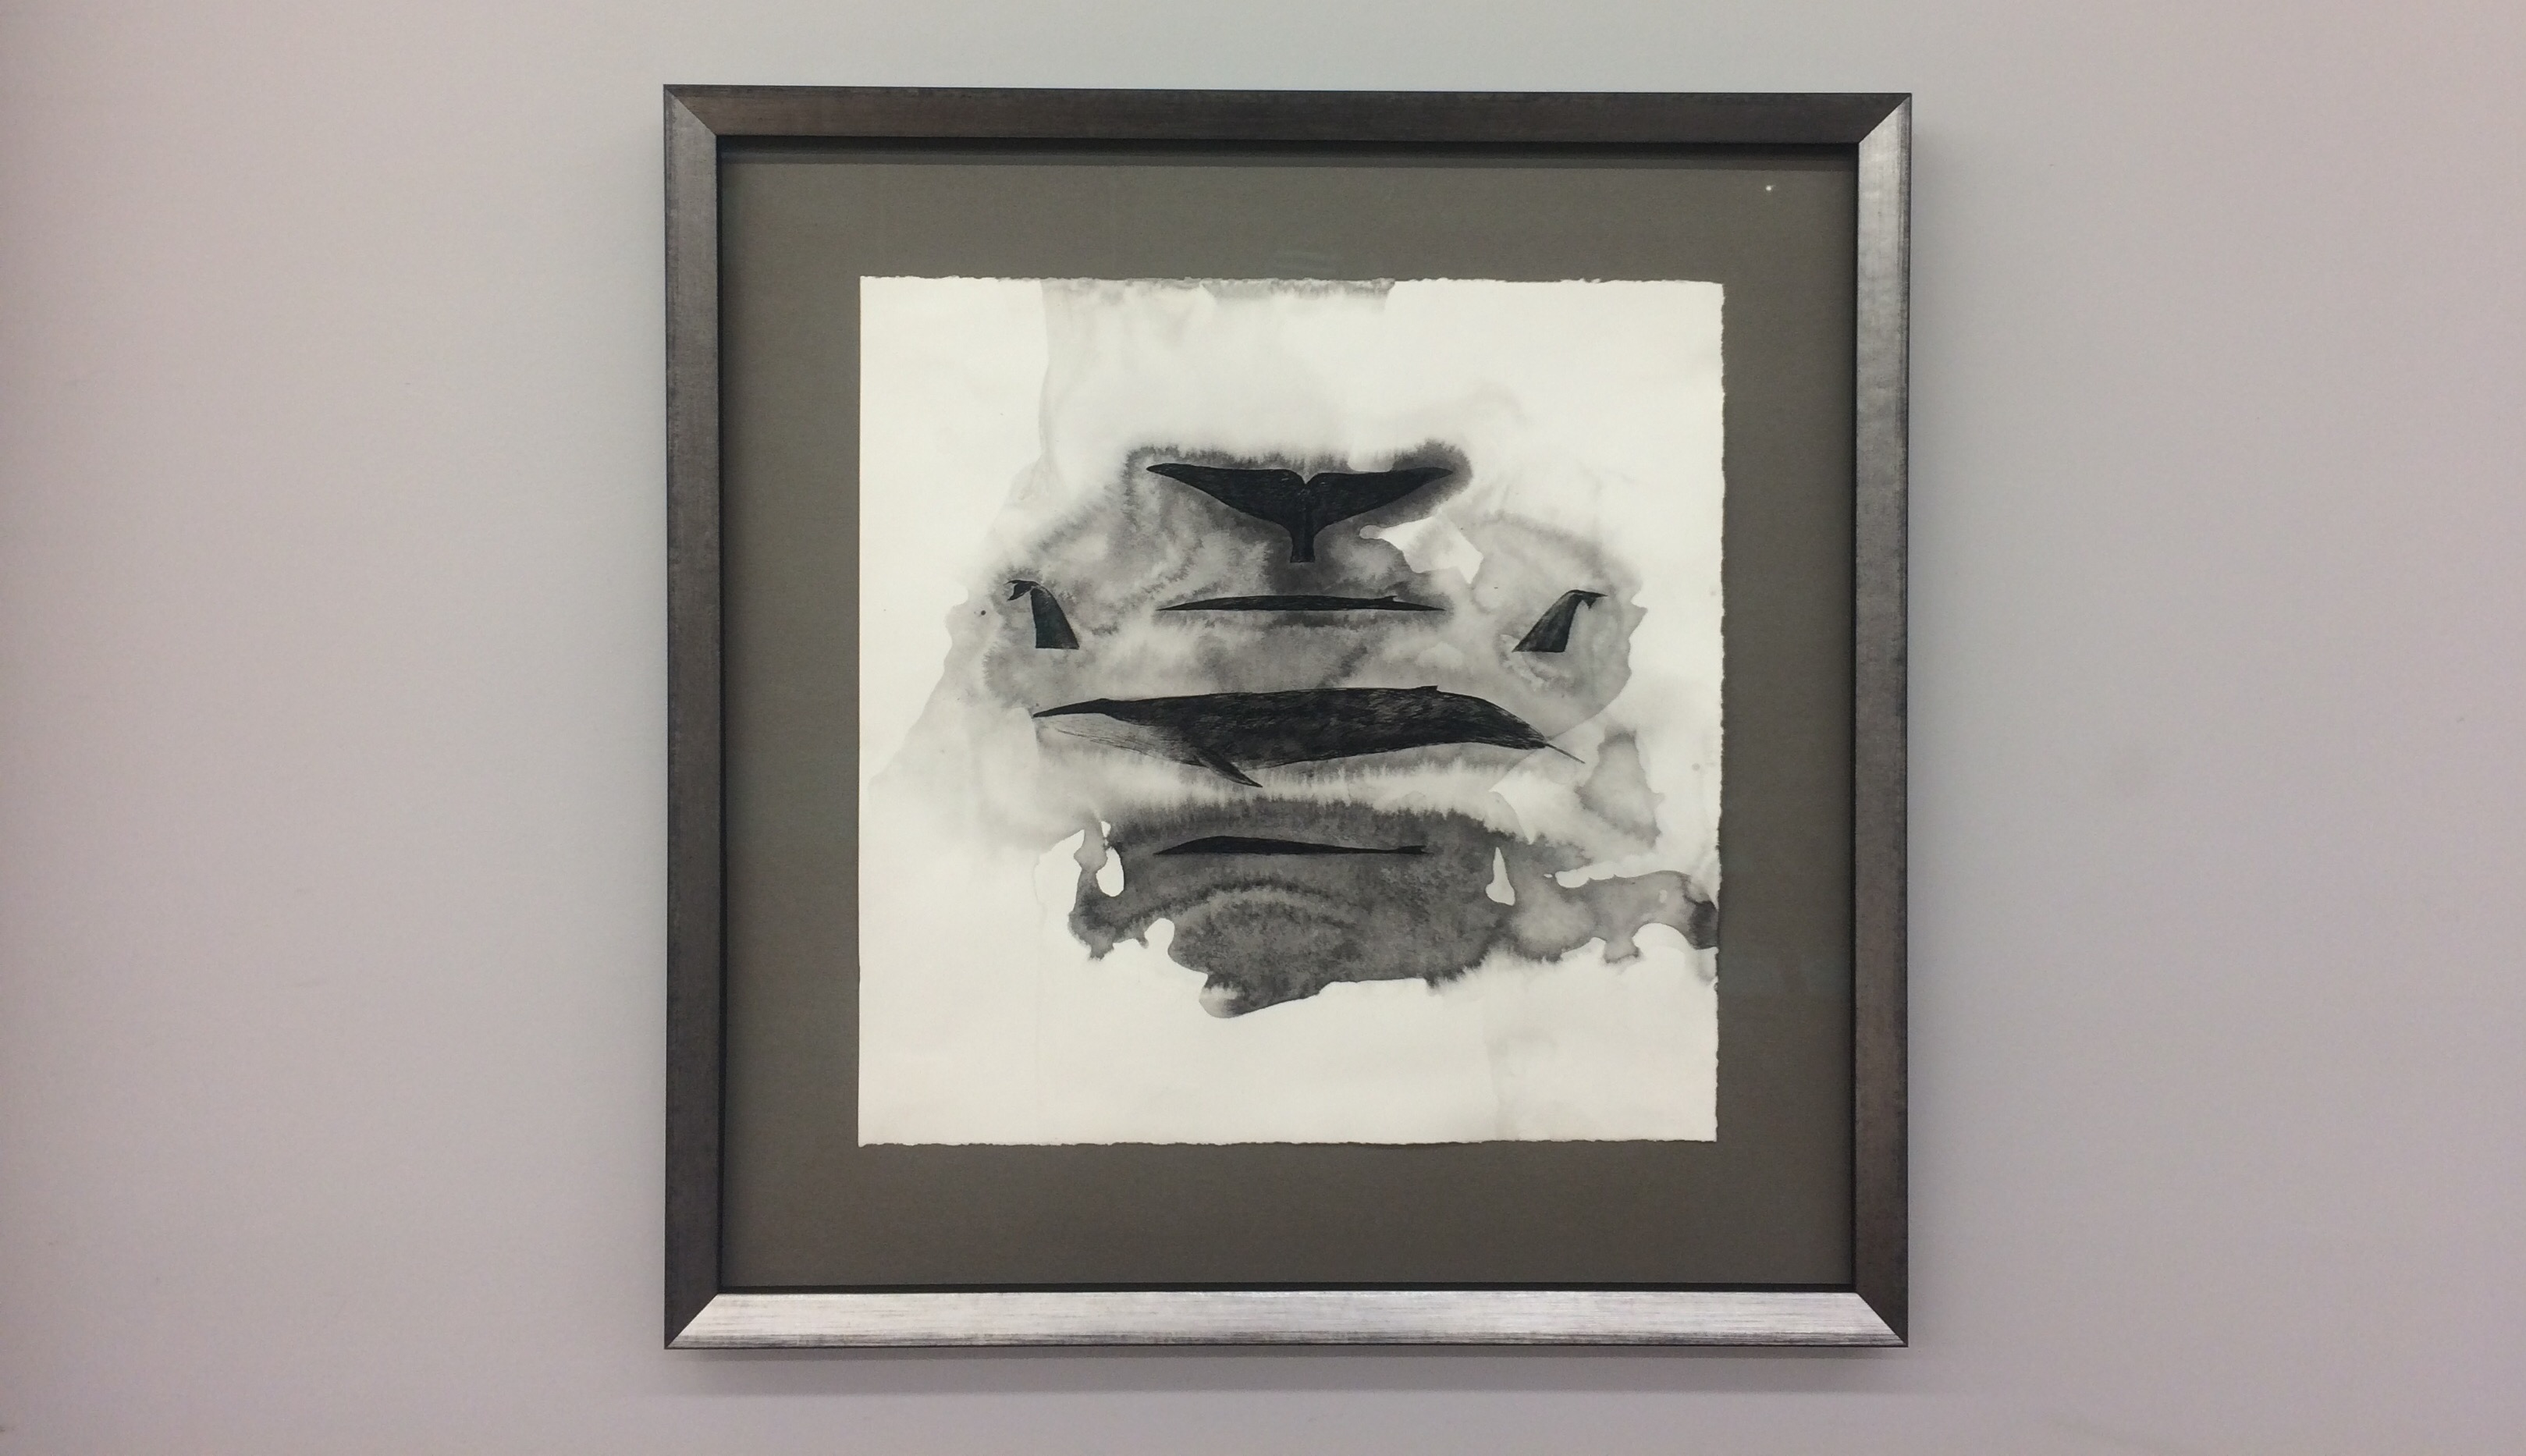 Artist-Natasha-van-Netten-whale-2-prestige-picture-framing-etcetera-victoria-bc